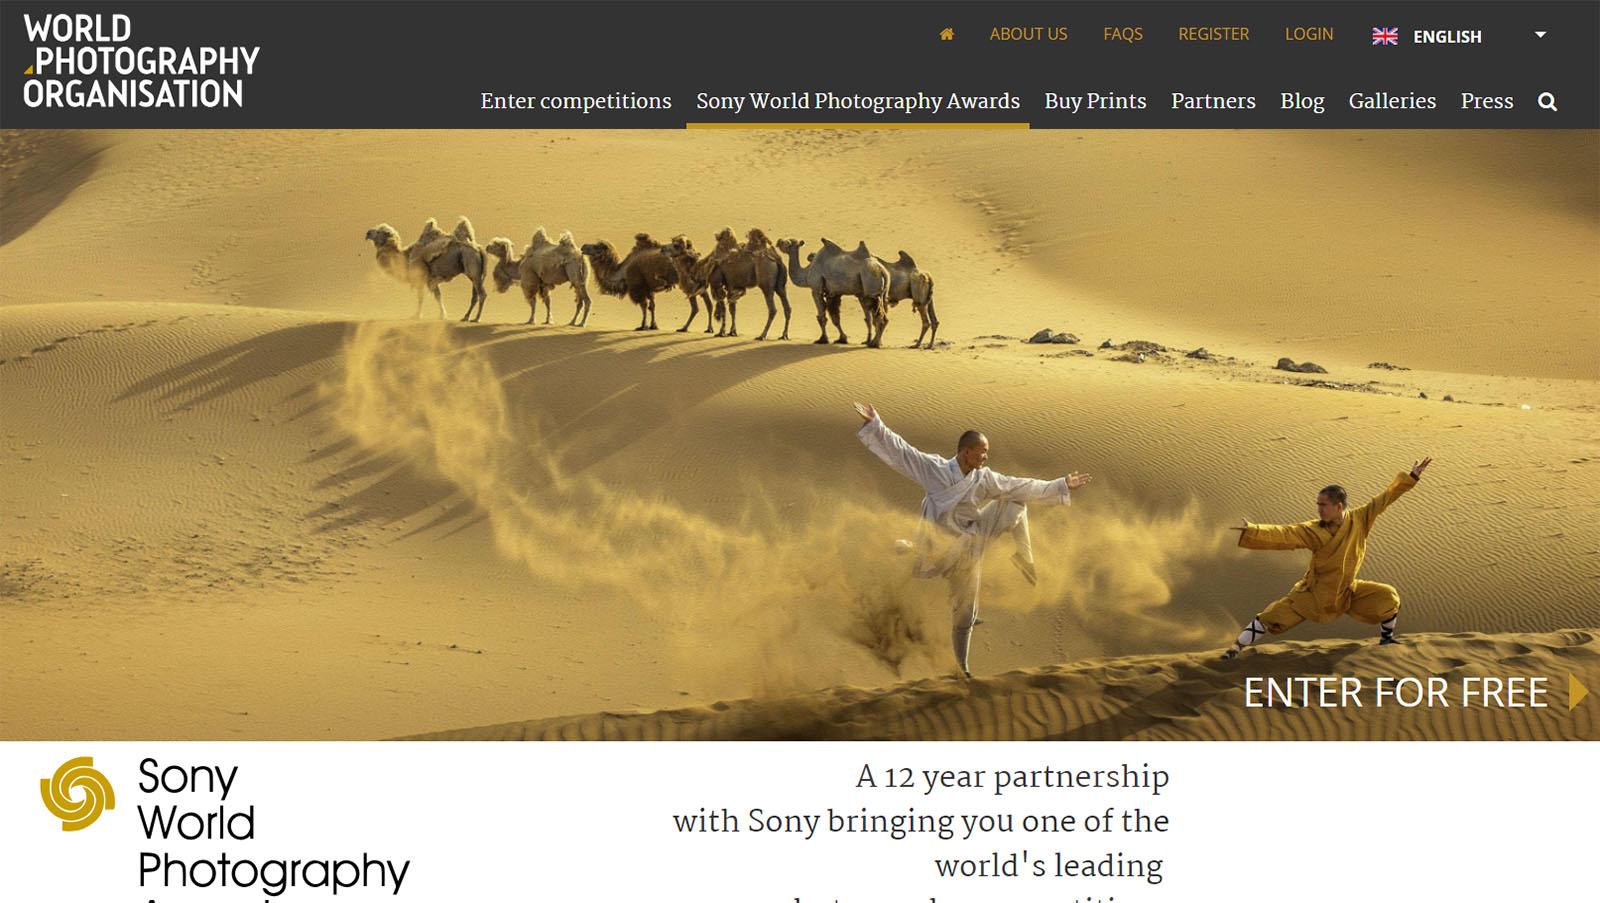 Sony World Photography Awards 2019 ($30,000 prize)